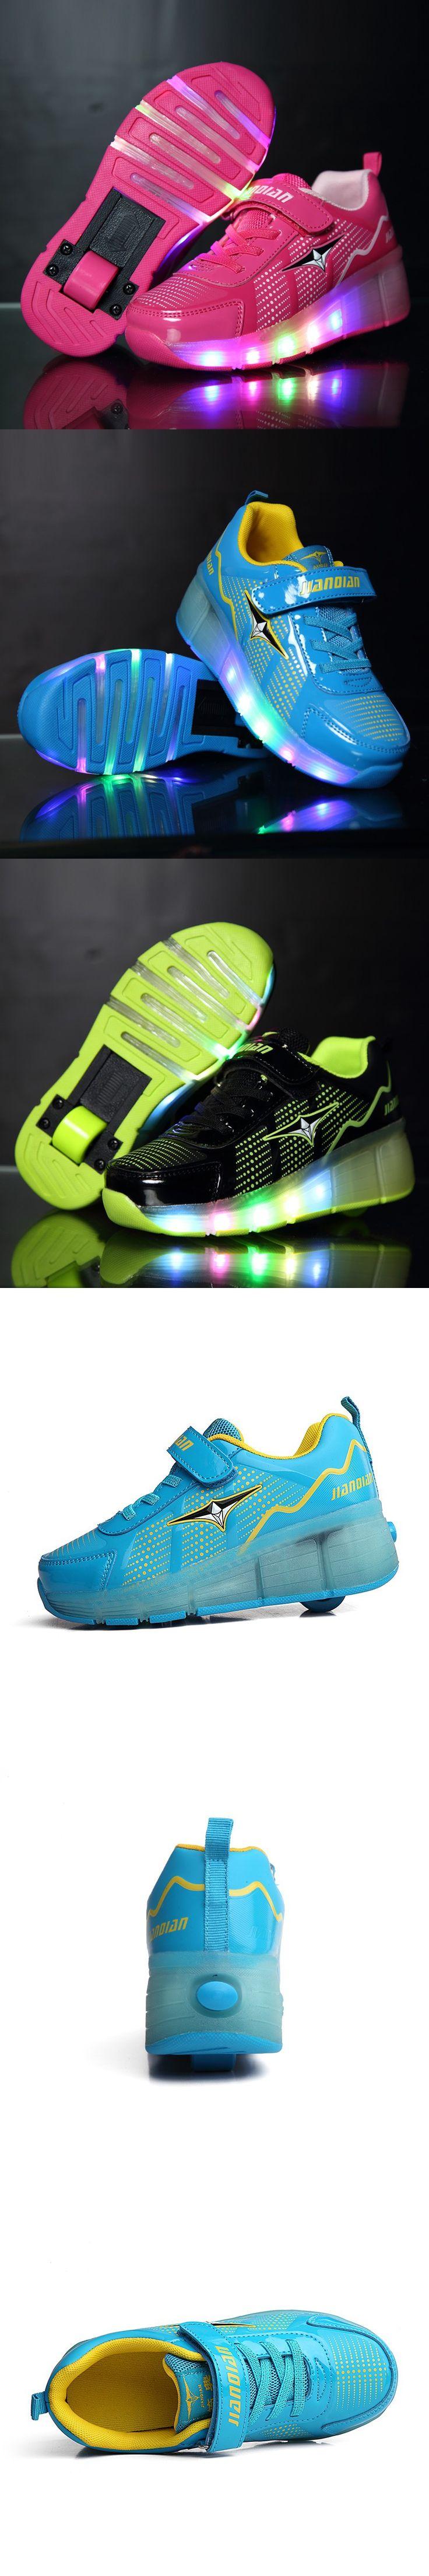 2016 Children Heelys Roller Sneaker With One Wheel LED Lighted Flashing Roller Skates Kids Boy Girl Shoes Zapatillas Con Ruedas